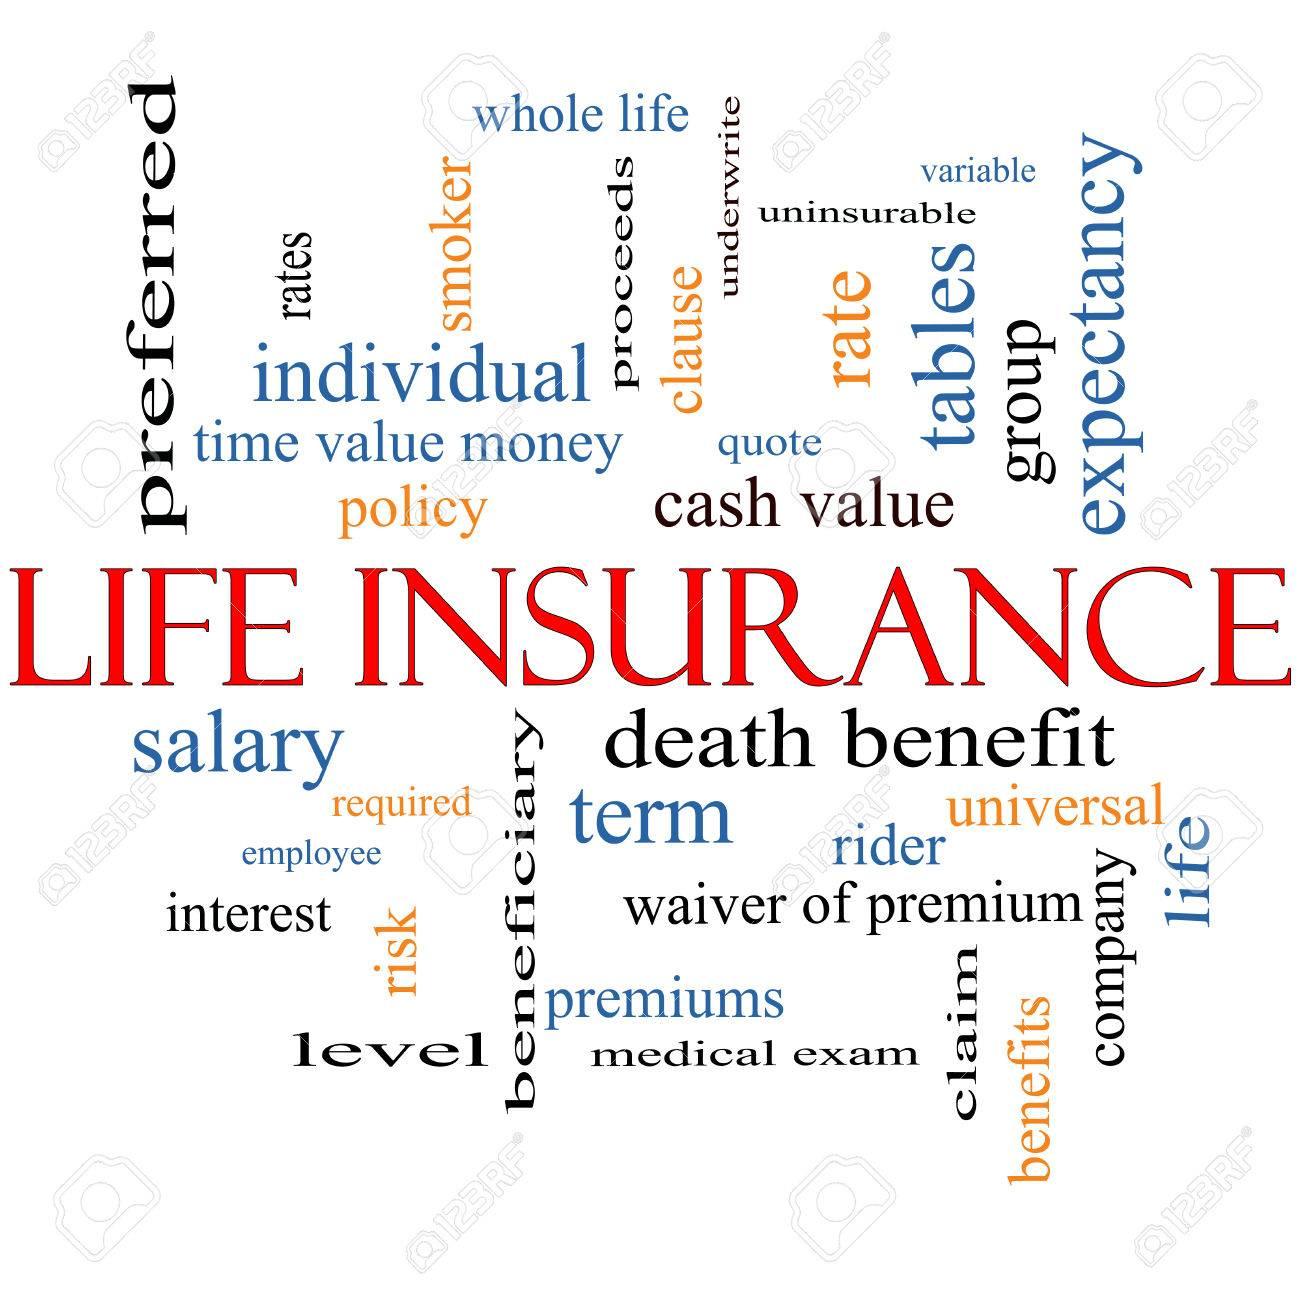 Quotes For Whole Life Insurance Unique Aig Whole Life Insurance Quotes